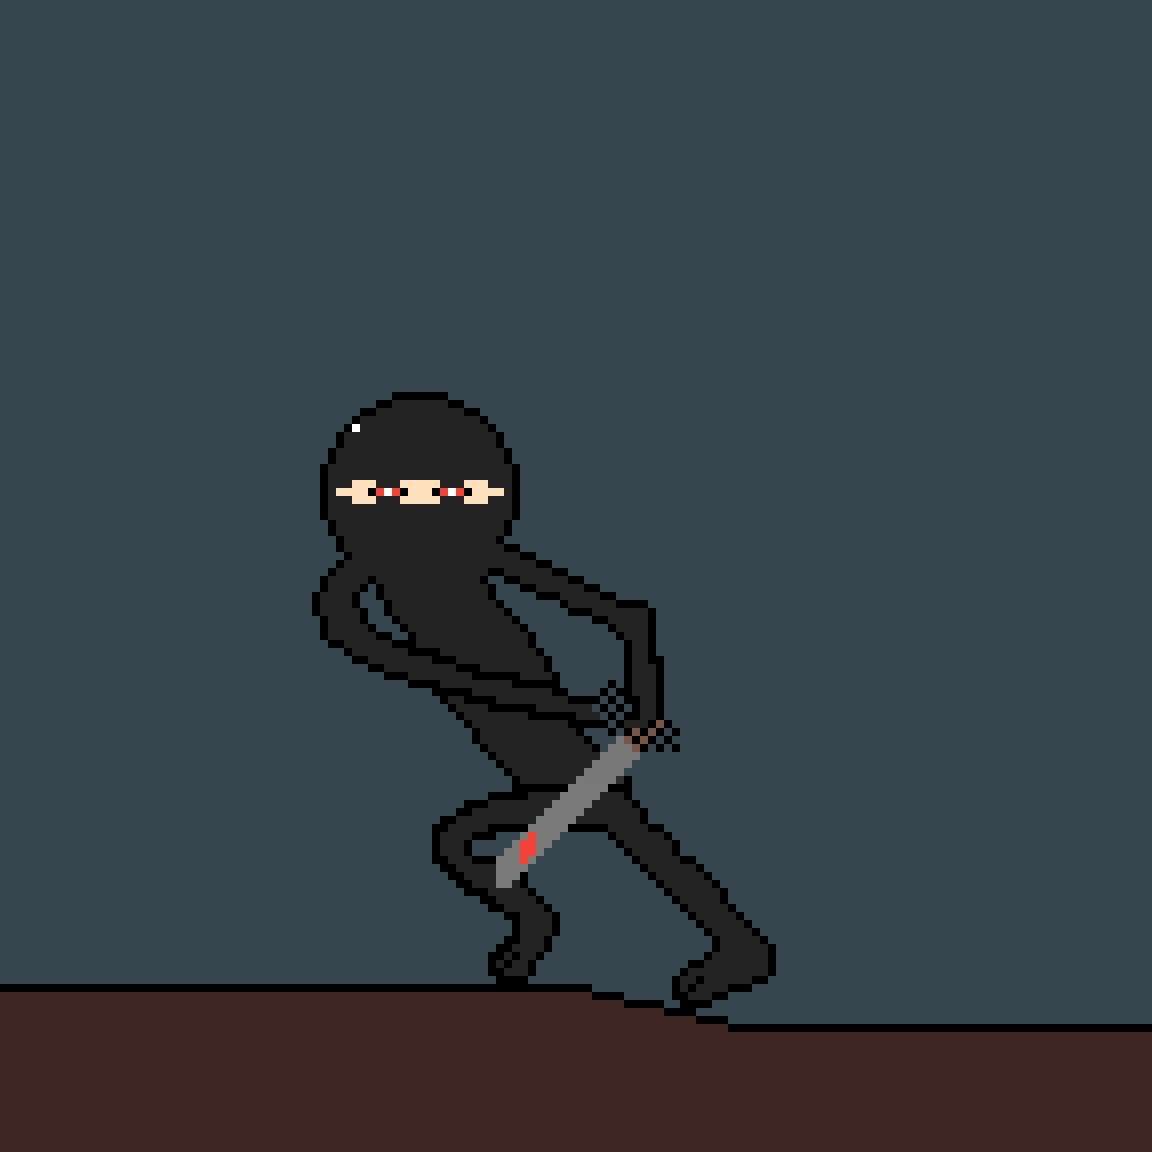 Red Eyed Ninja